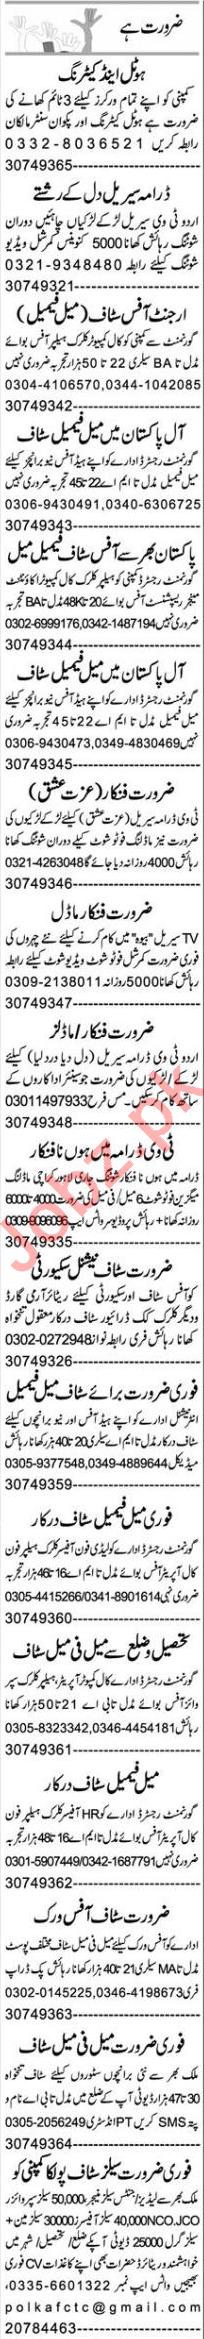 Assistant Supervisor & Web Developer Jobs 2020 in Faisalabad